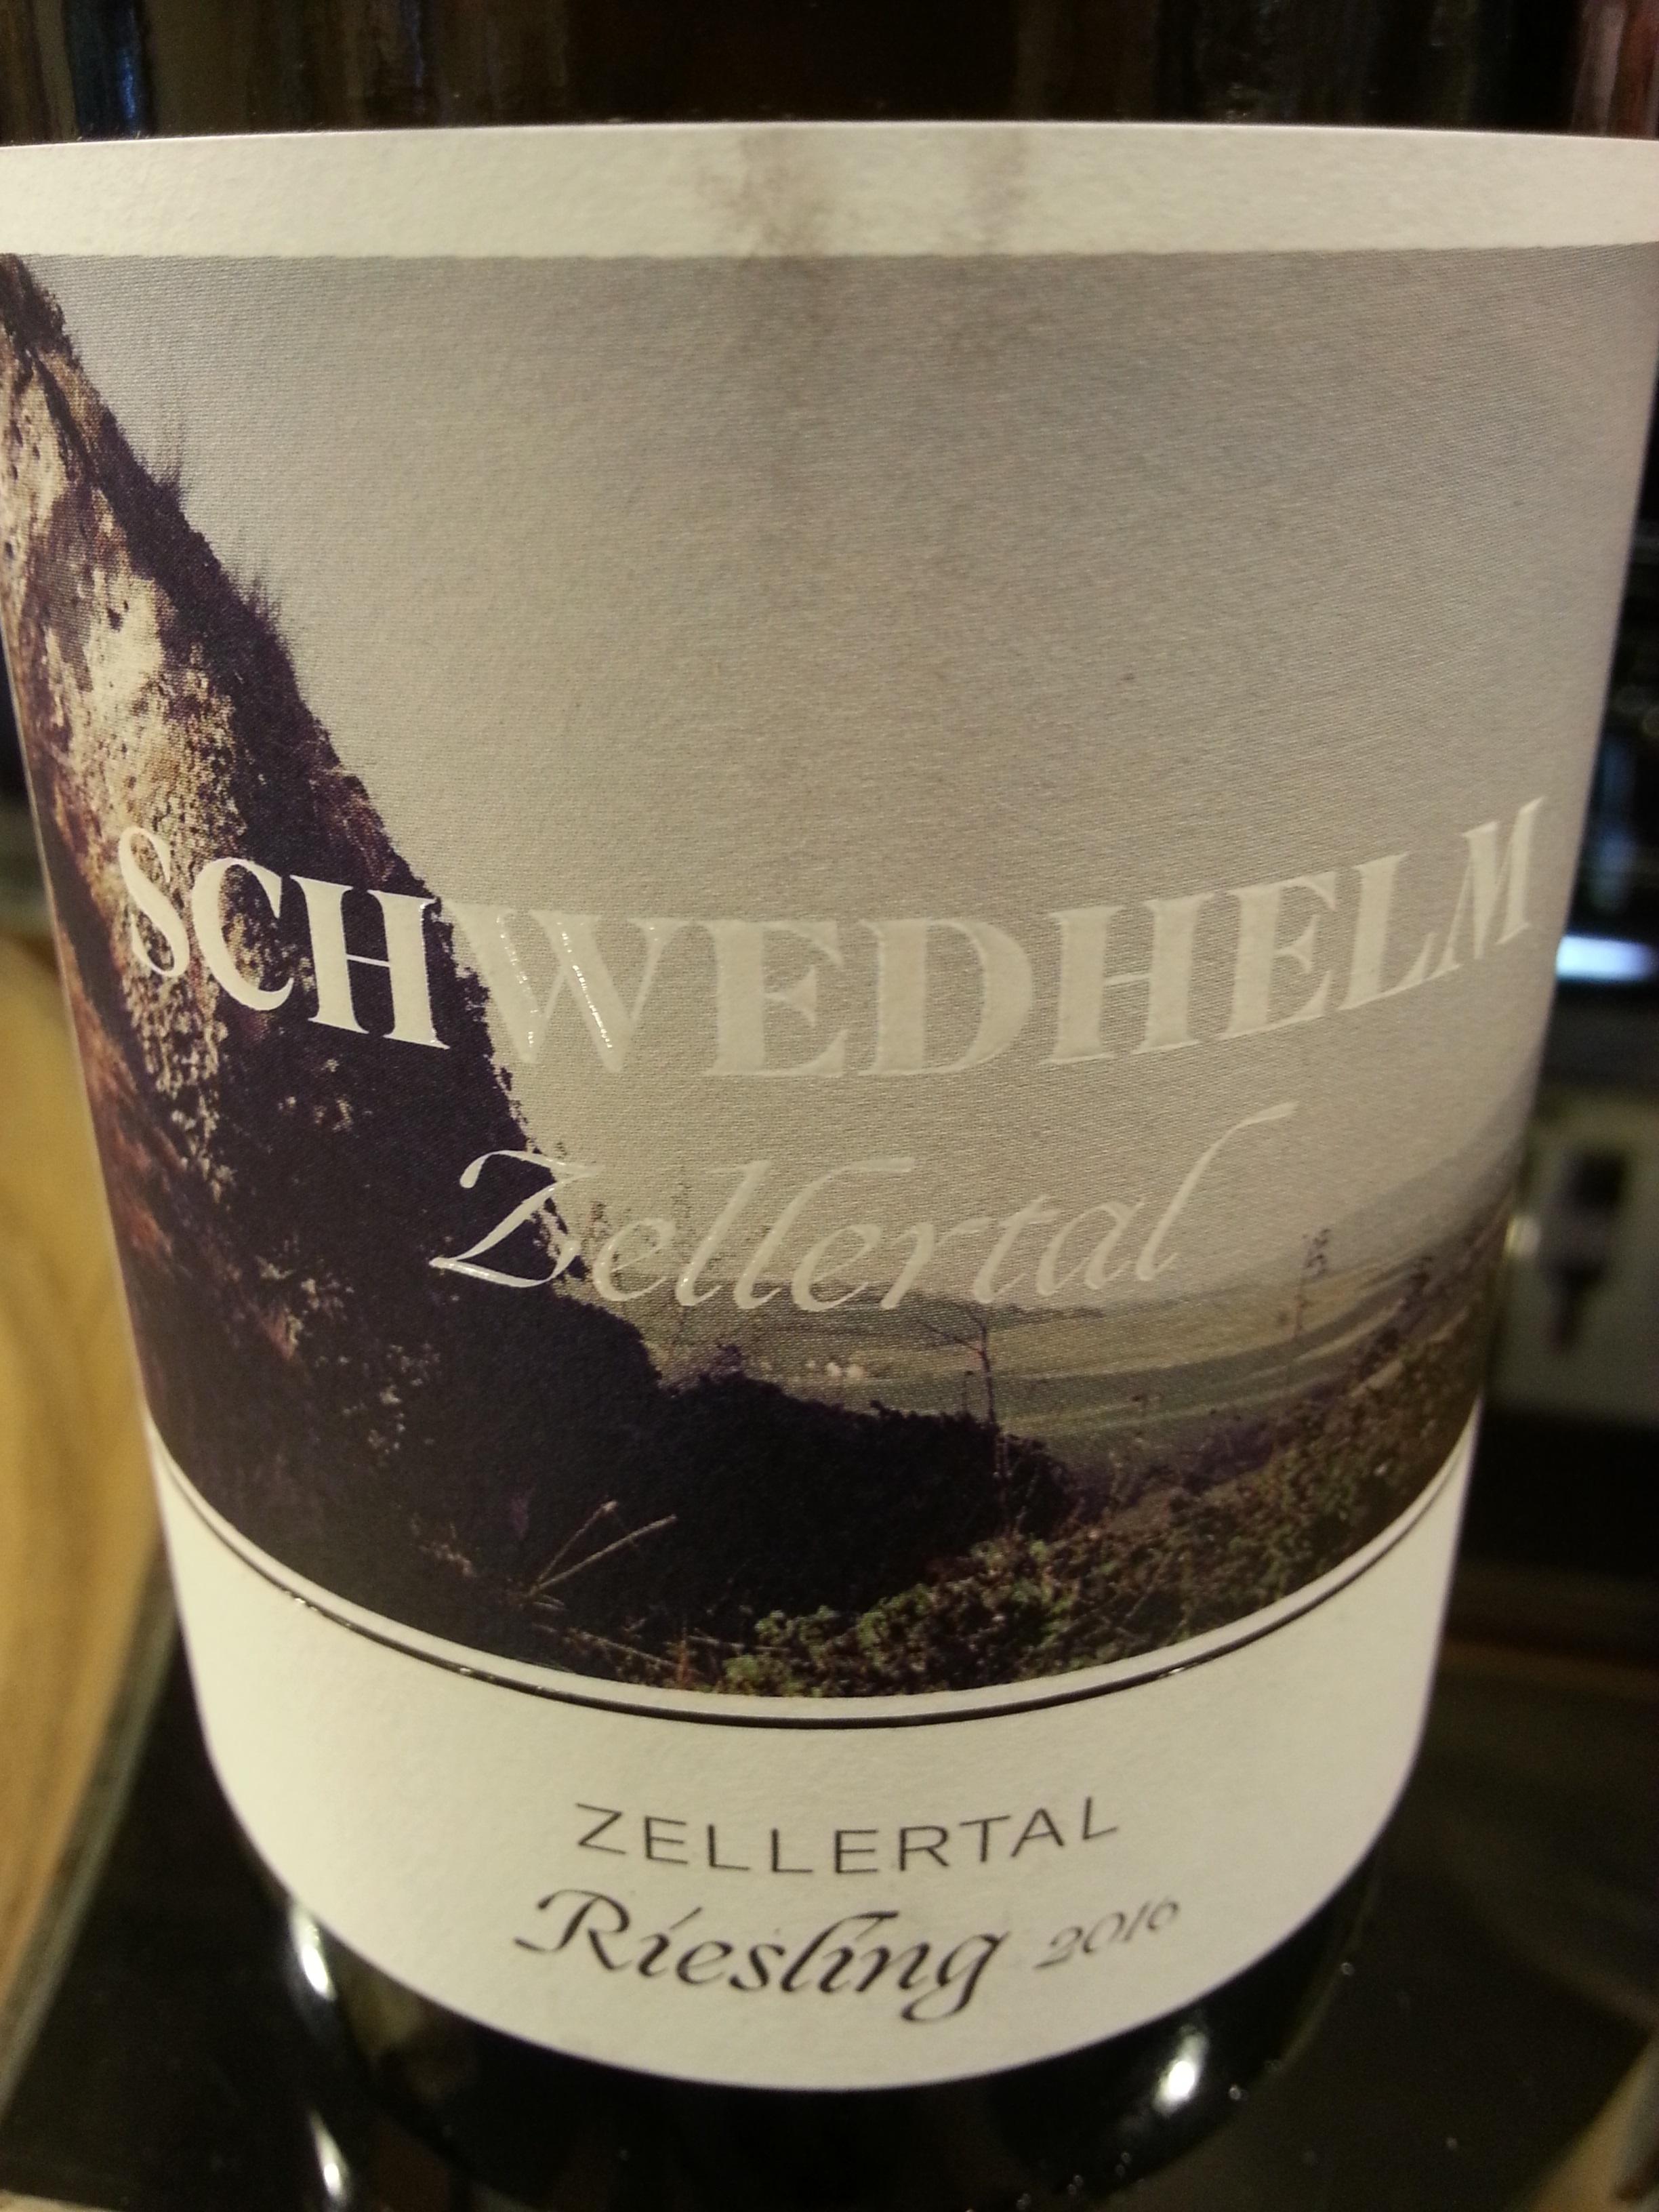 2016 Riesling Zellertal | Schwedhelm